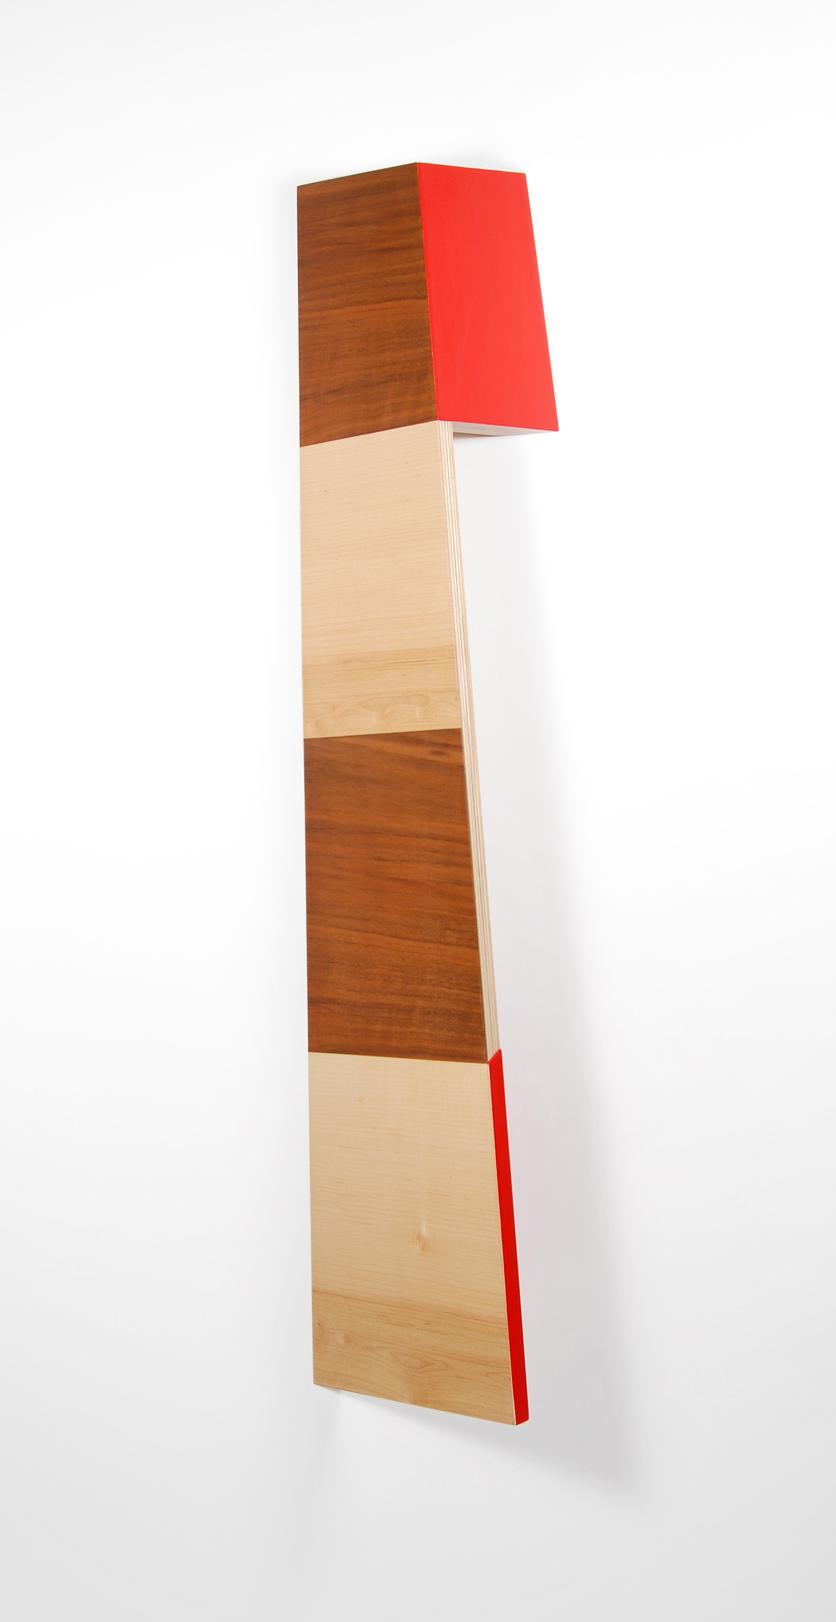 Richard Bottwin   Right Angle.1   2018  Maple veneer, walnut veneer and acrylic paint on birch plywood  34 x 9 x 6 inches